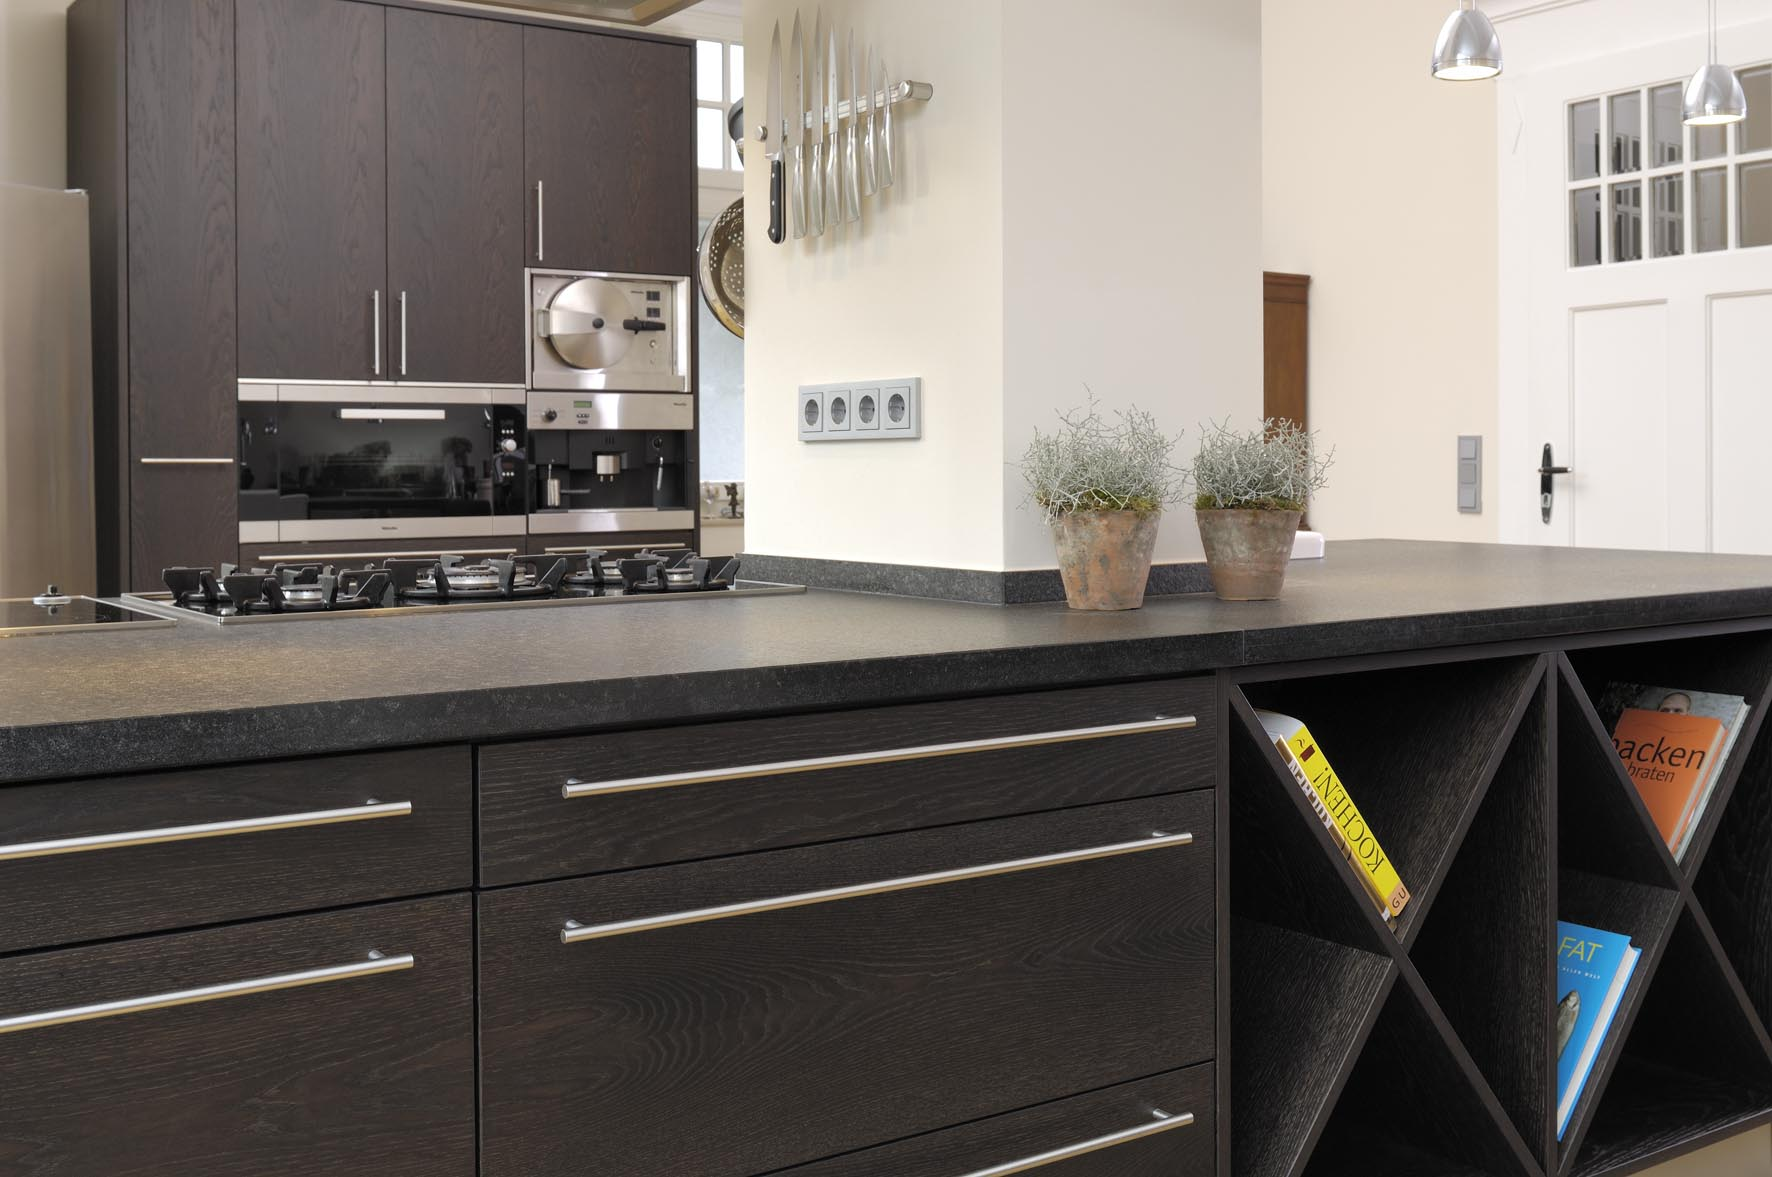 sp h m bel innenausbau in essen. Black Bedroom Furniture Sets. Home Design Ideas